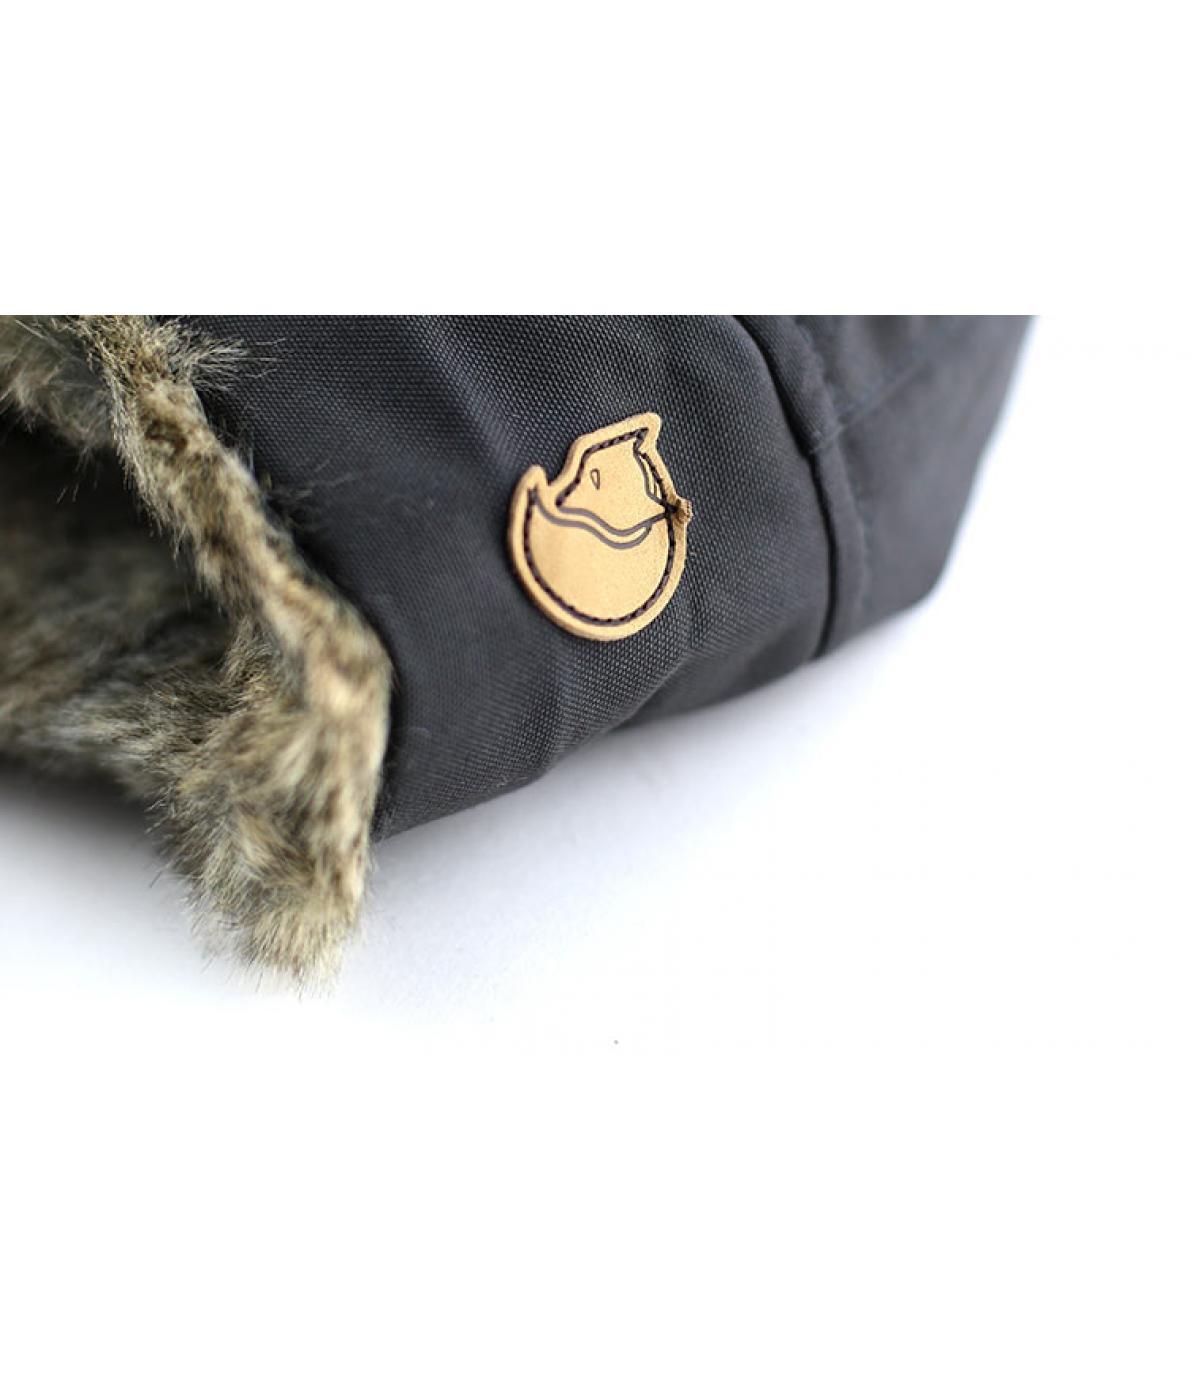 Details Singi heater dark grey - afbeeling 4